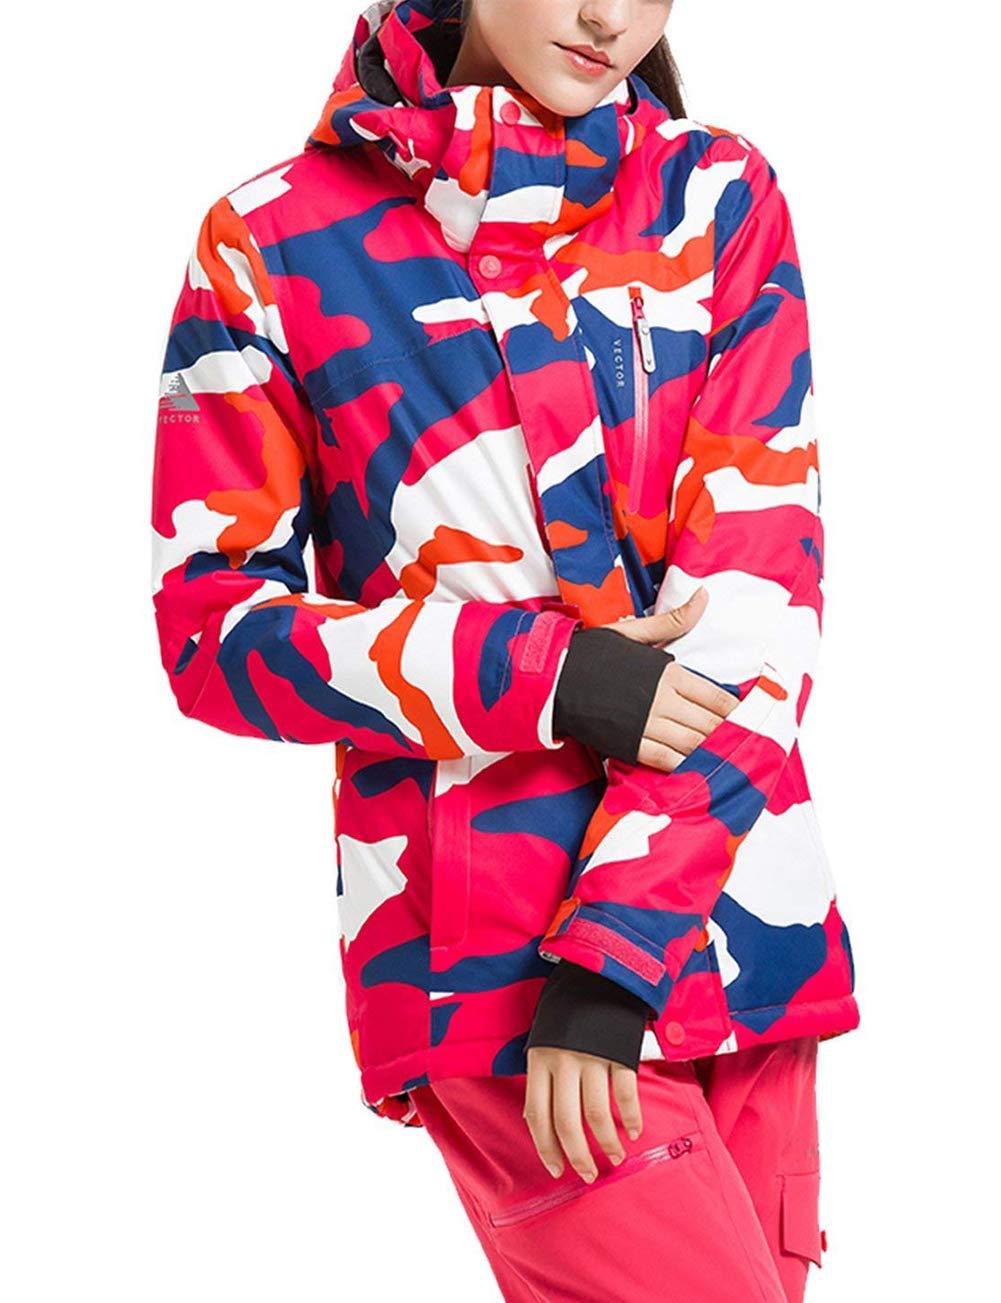 Women Ski Jacket Mountain Waterproof Windproof Rain Snow Coat Snowboarding Winter Warm Outdoor Outwear VECTOR